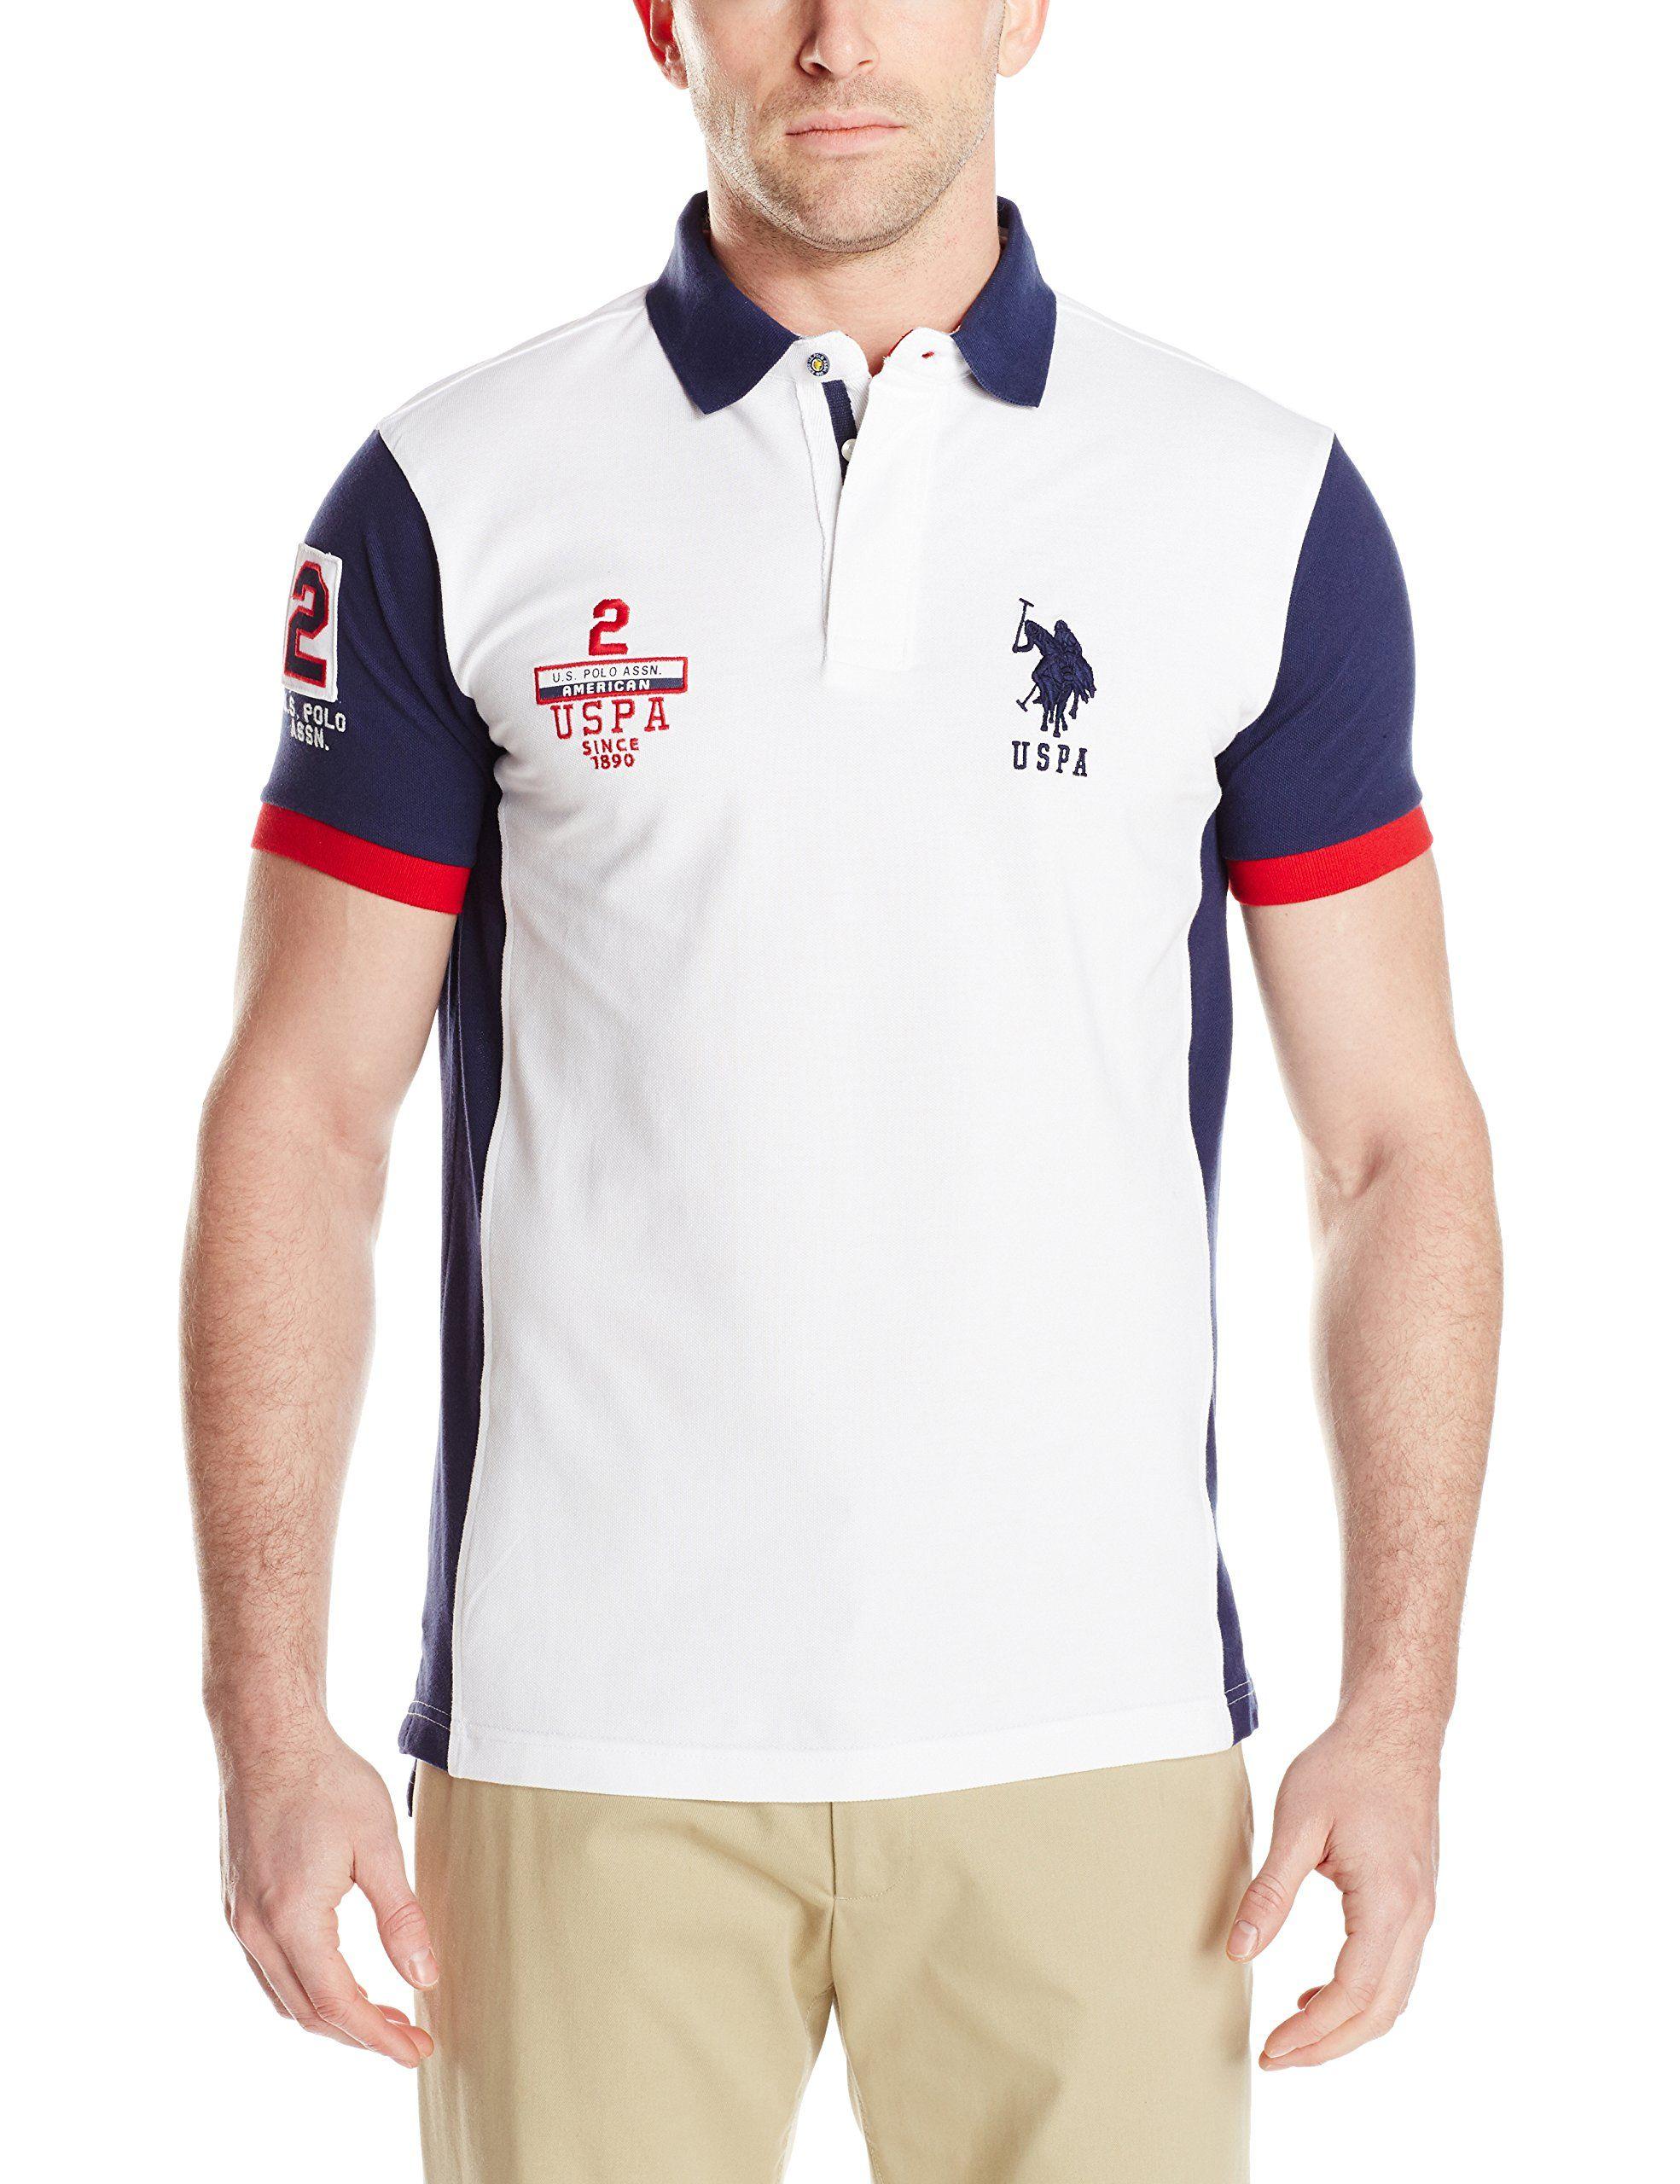 U.S. Polo Assn. Men's Color Block Slim Fit Pique Polo, White ...